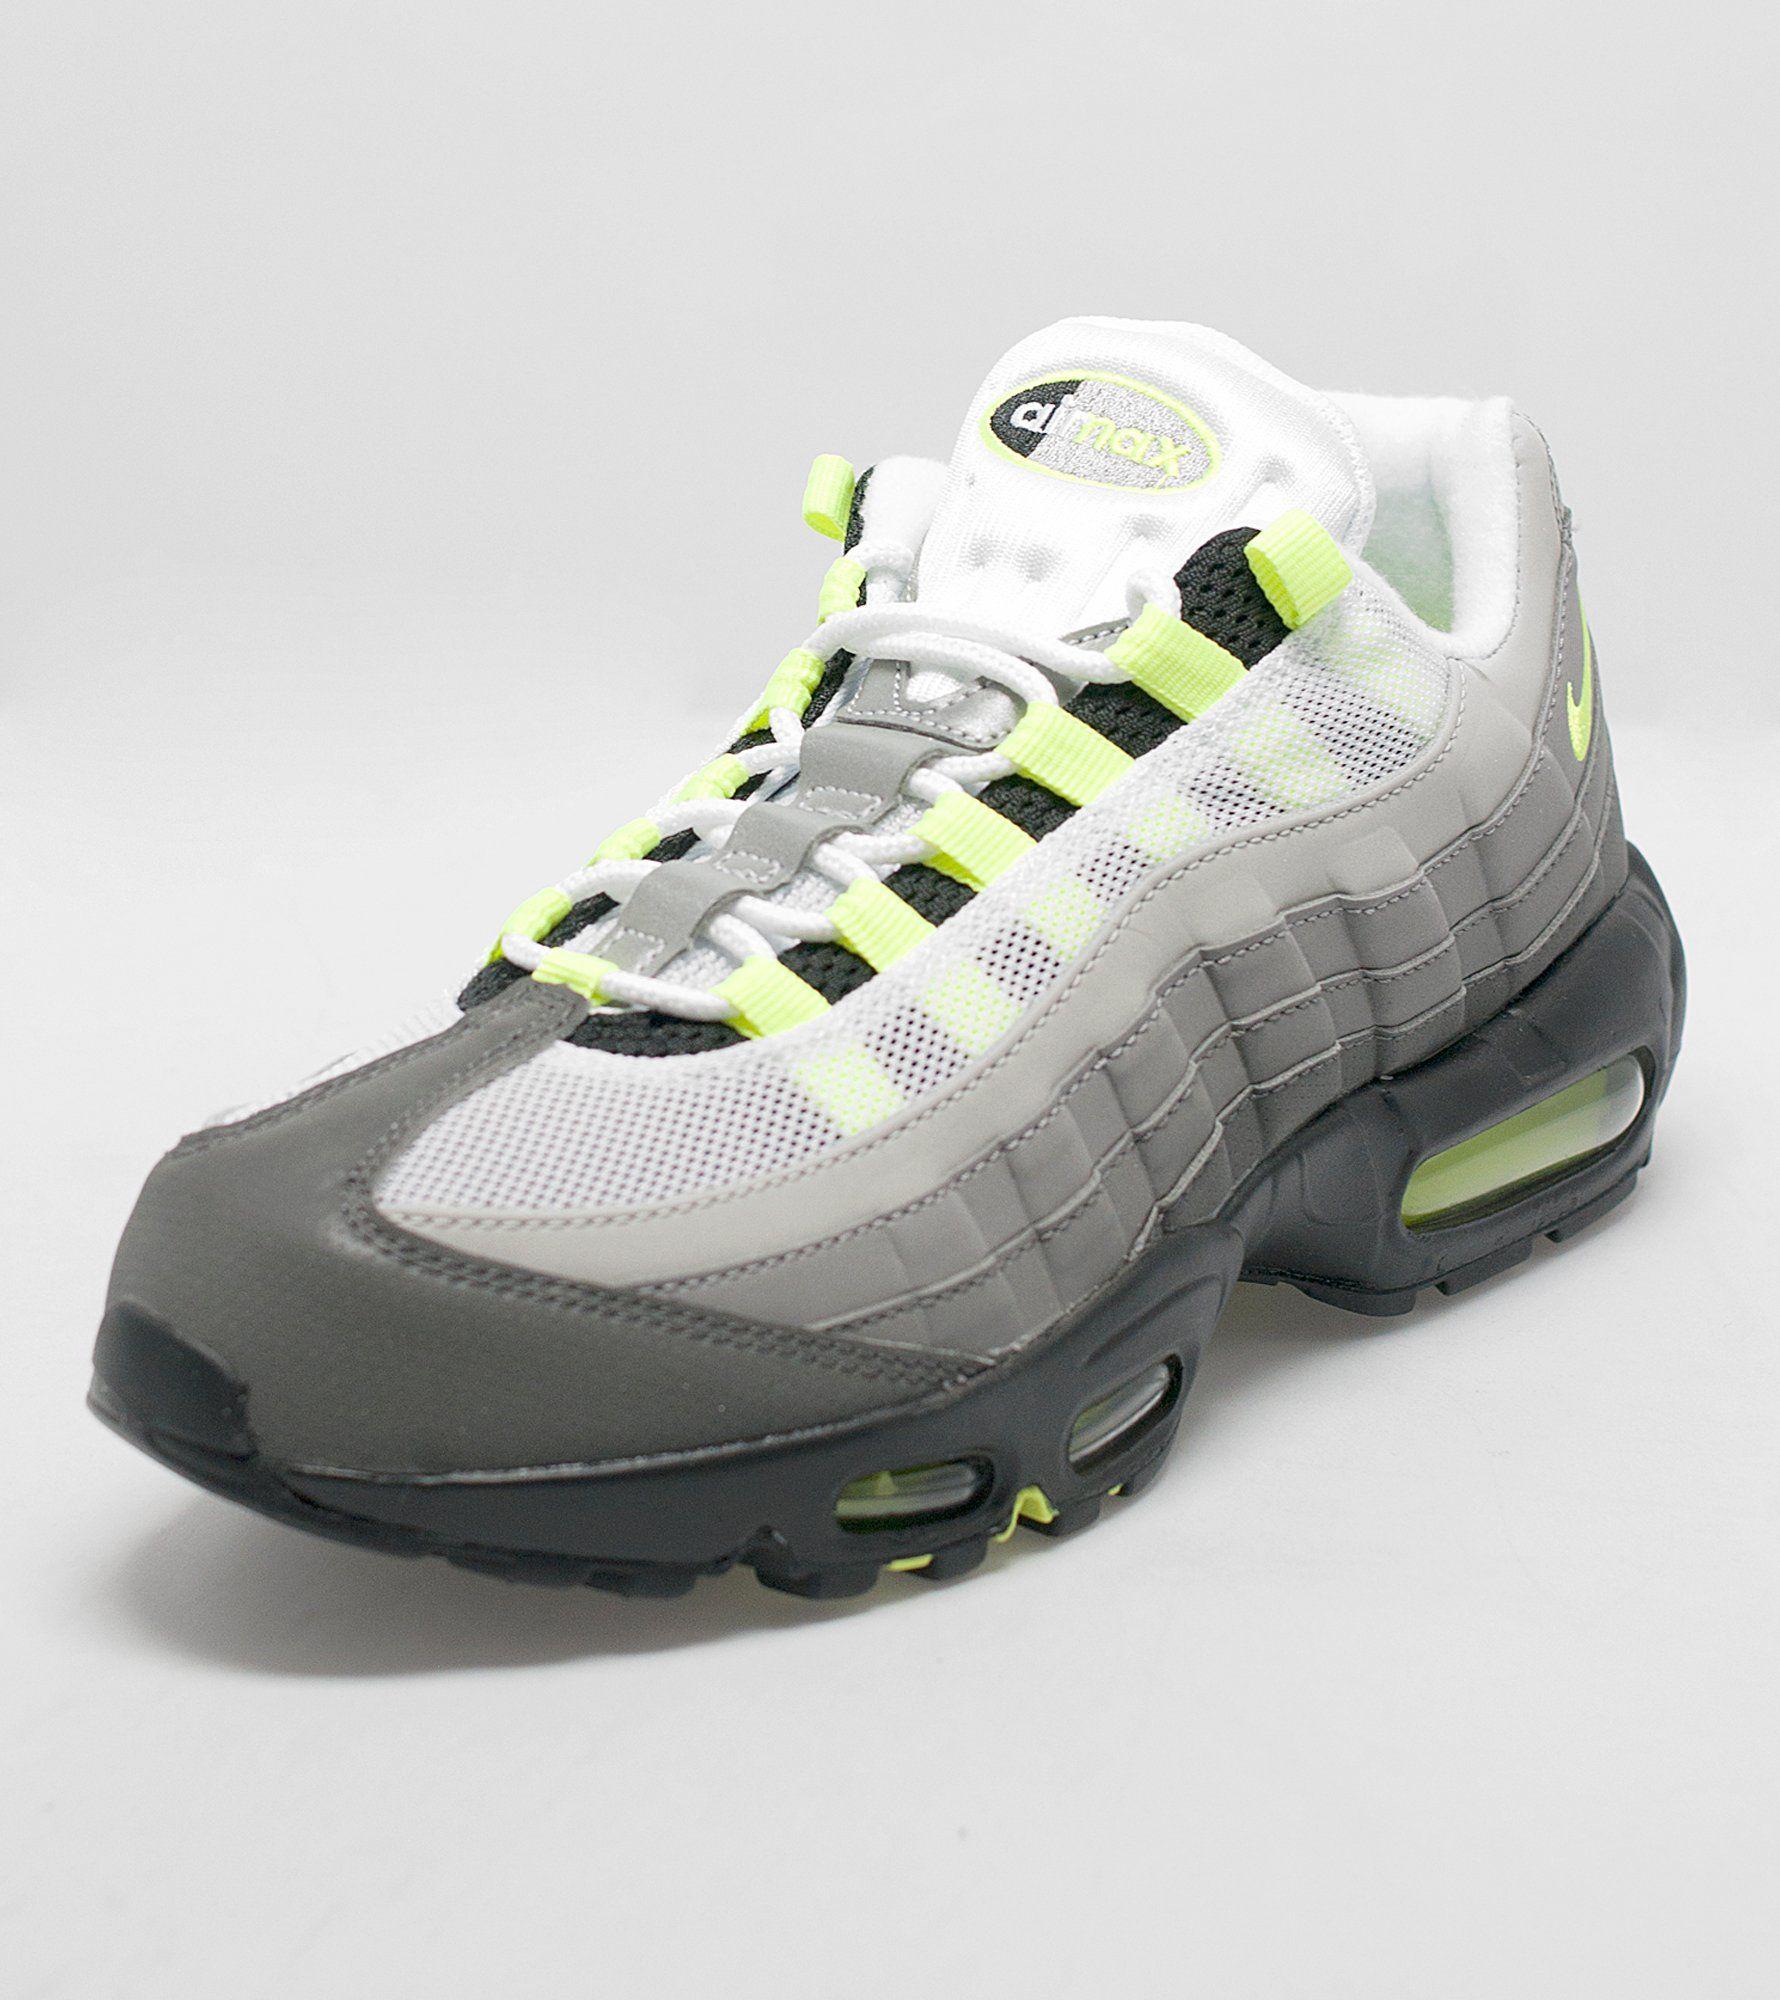 sports shoes ac921 36af7 ... new arrivals nike air max 95 og reflective 23e71 23c35